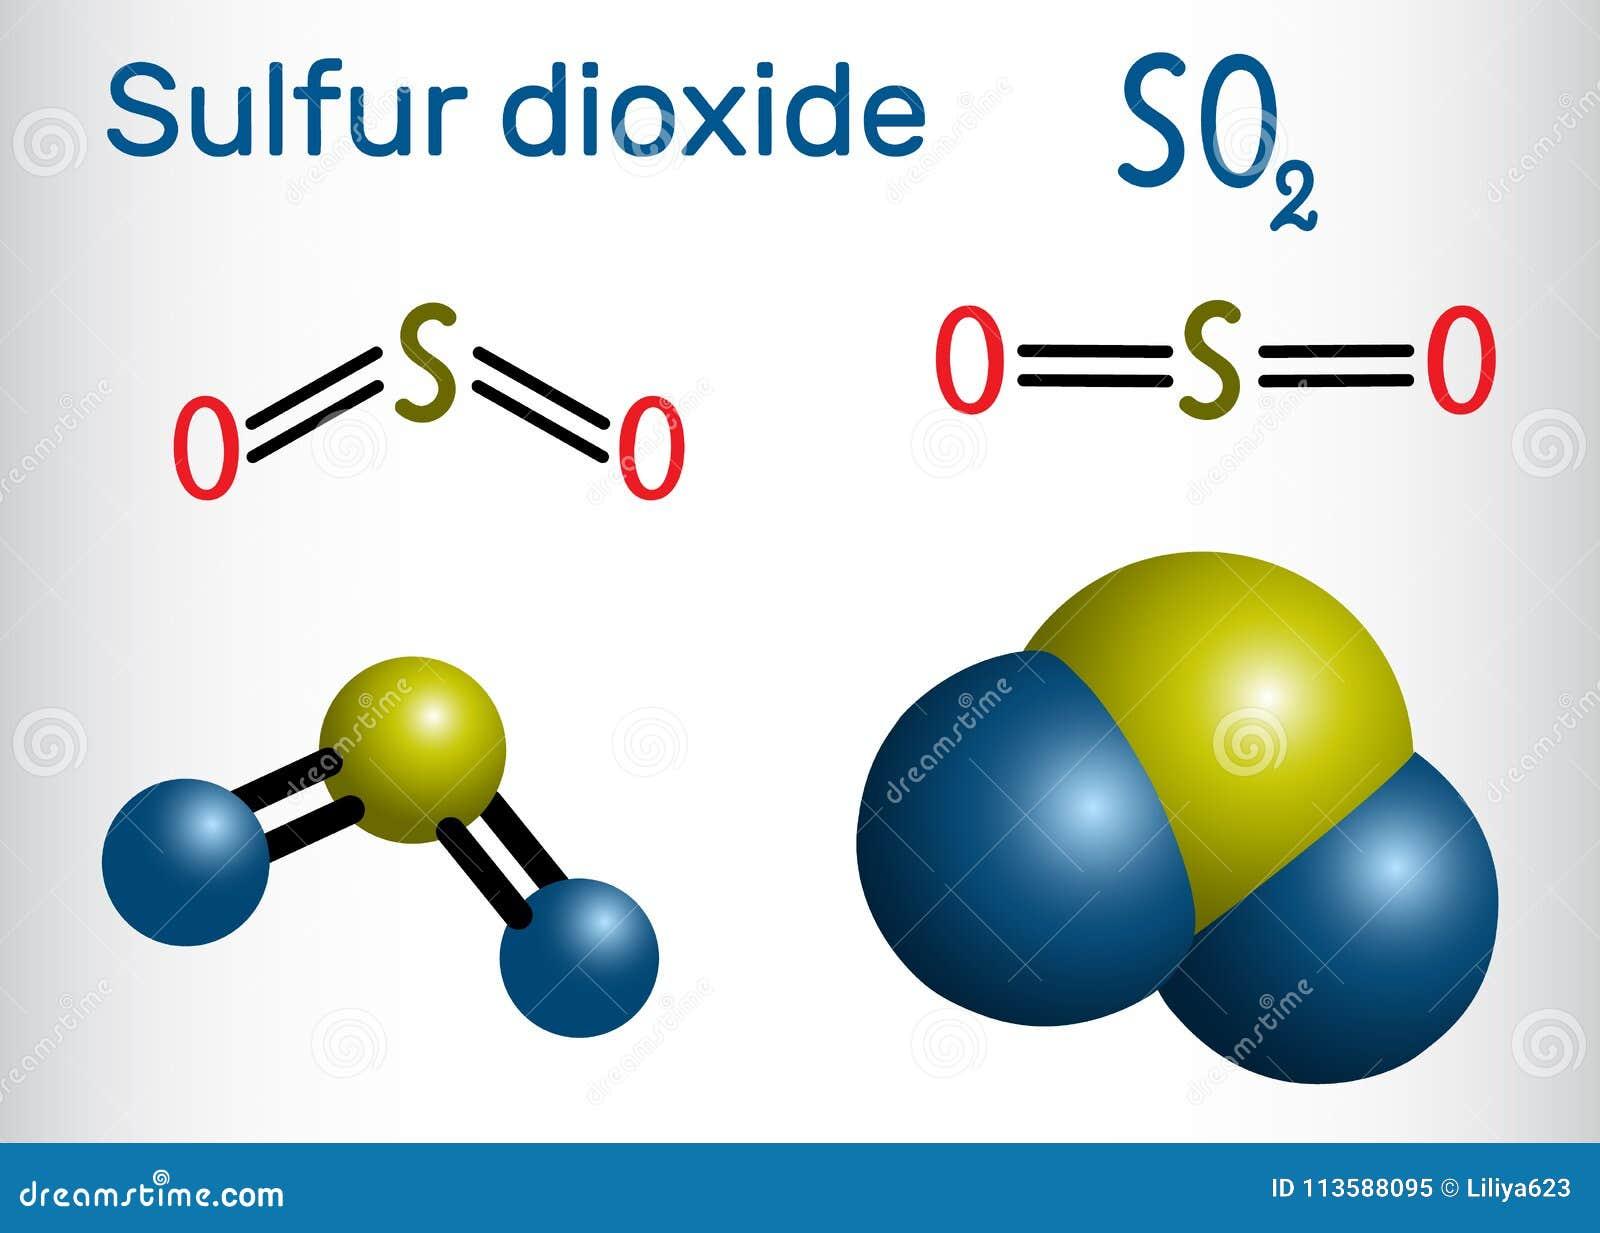 Sulfur Dioxide Sulphur Dioxide So2 Molecule Structural Chemi Stock